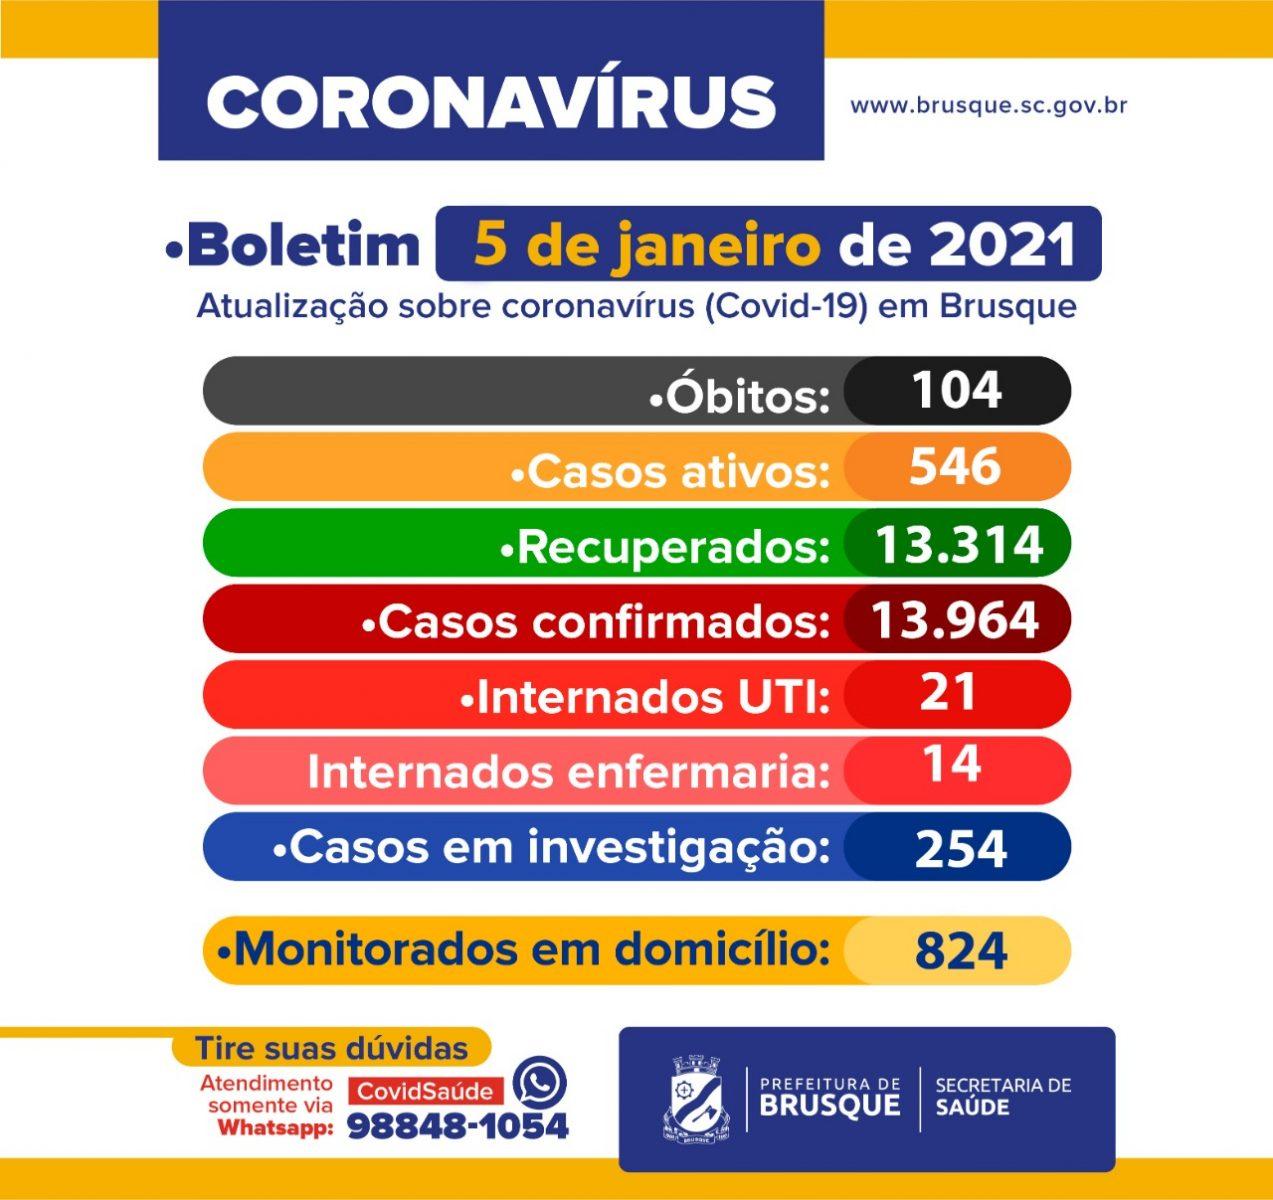 Covid-19: Confira o boletim epidemiológico desta terça-feira (5)